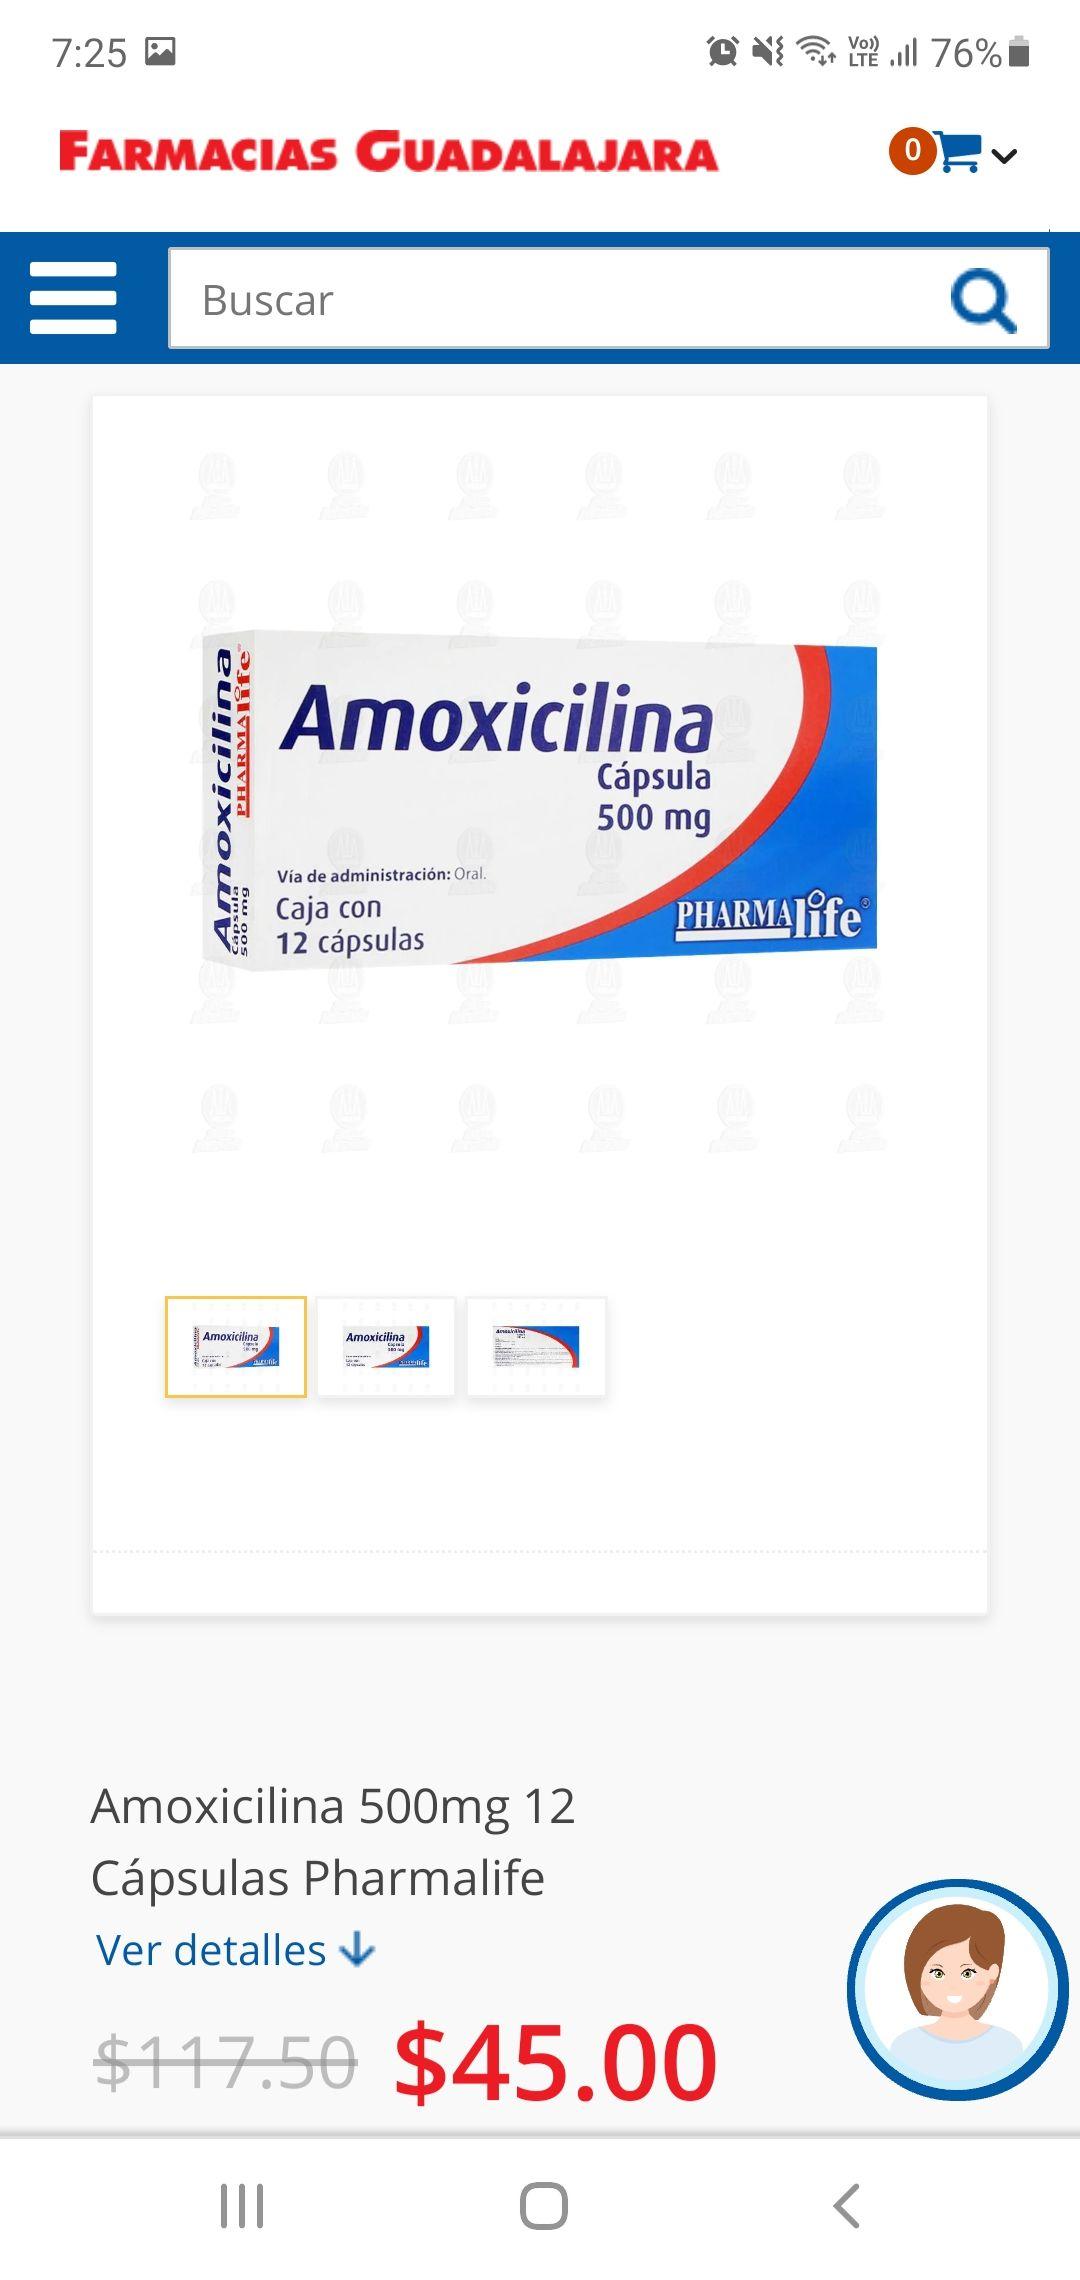 Farmacias Guadalajara: Amoxicilina 12 capsulas 500 mg c/u